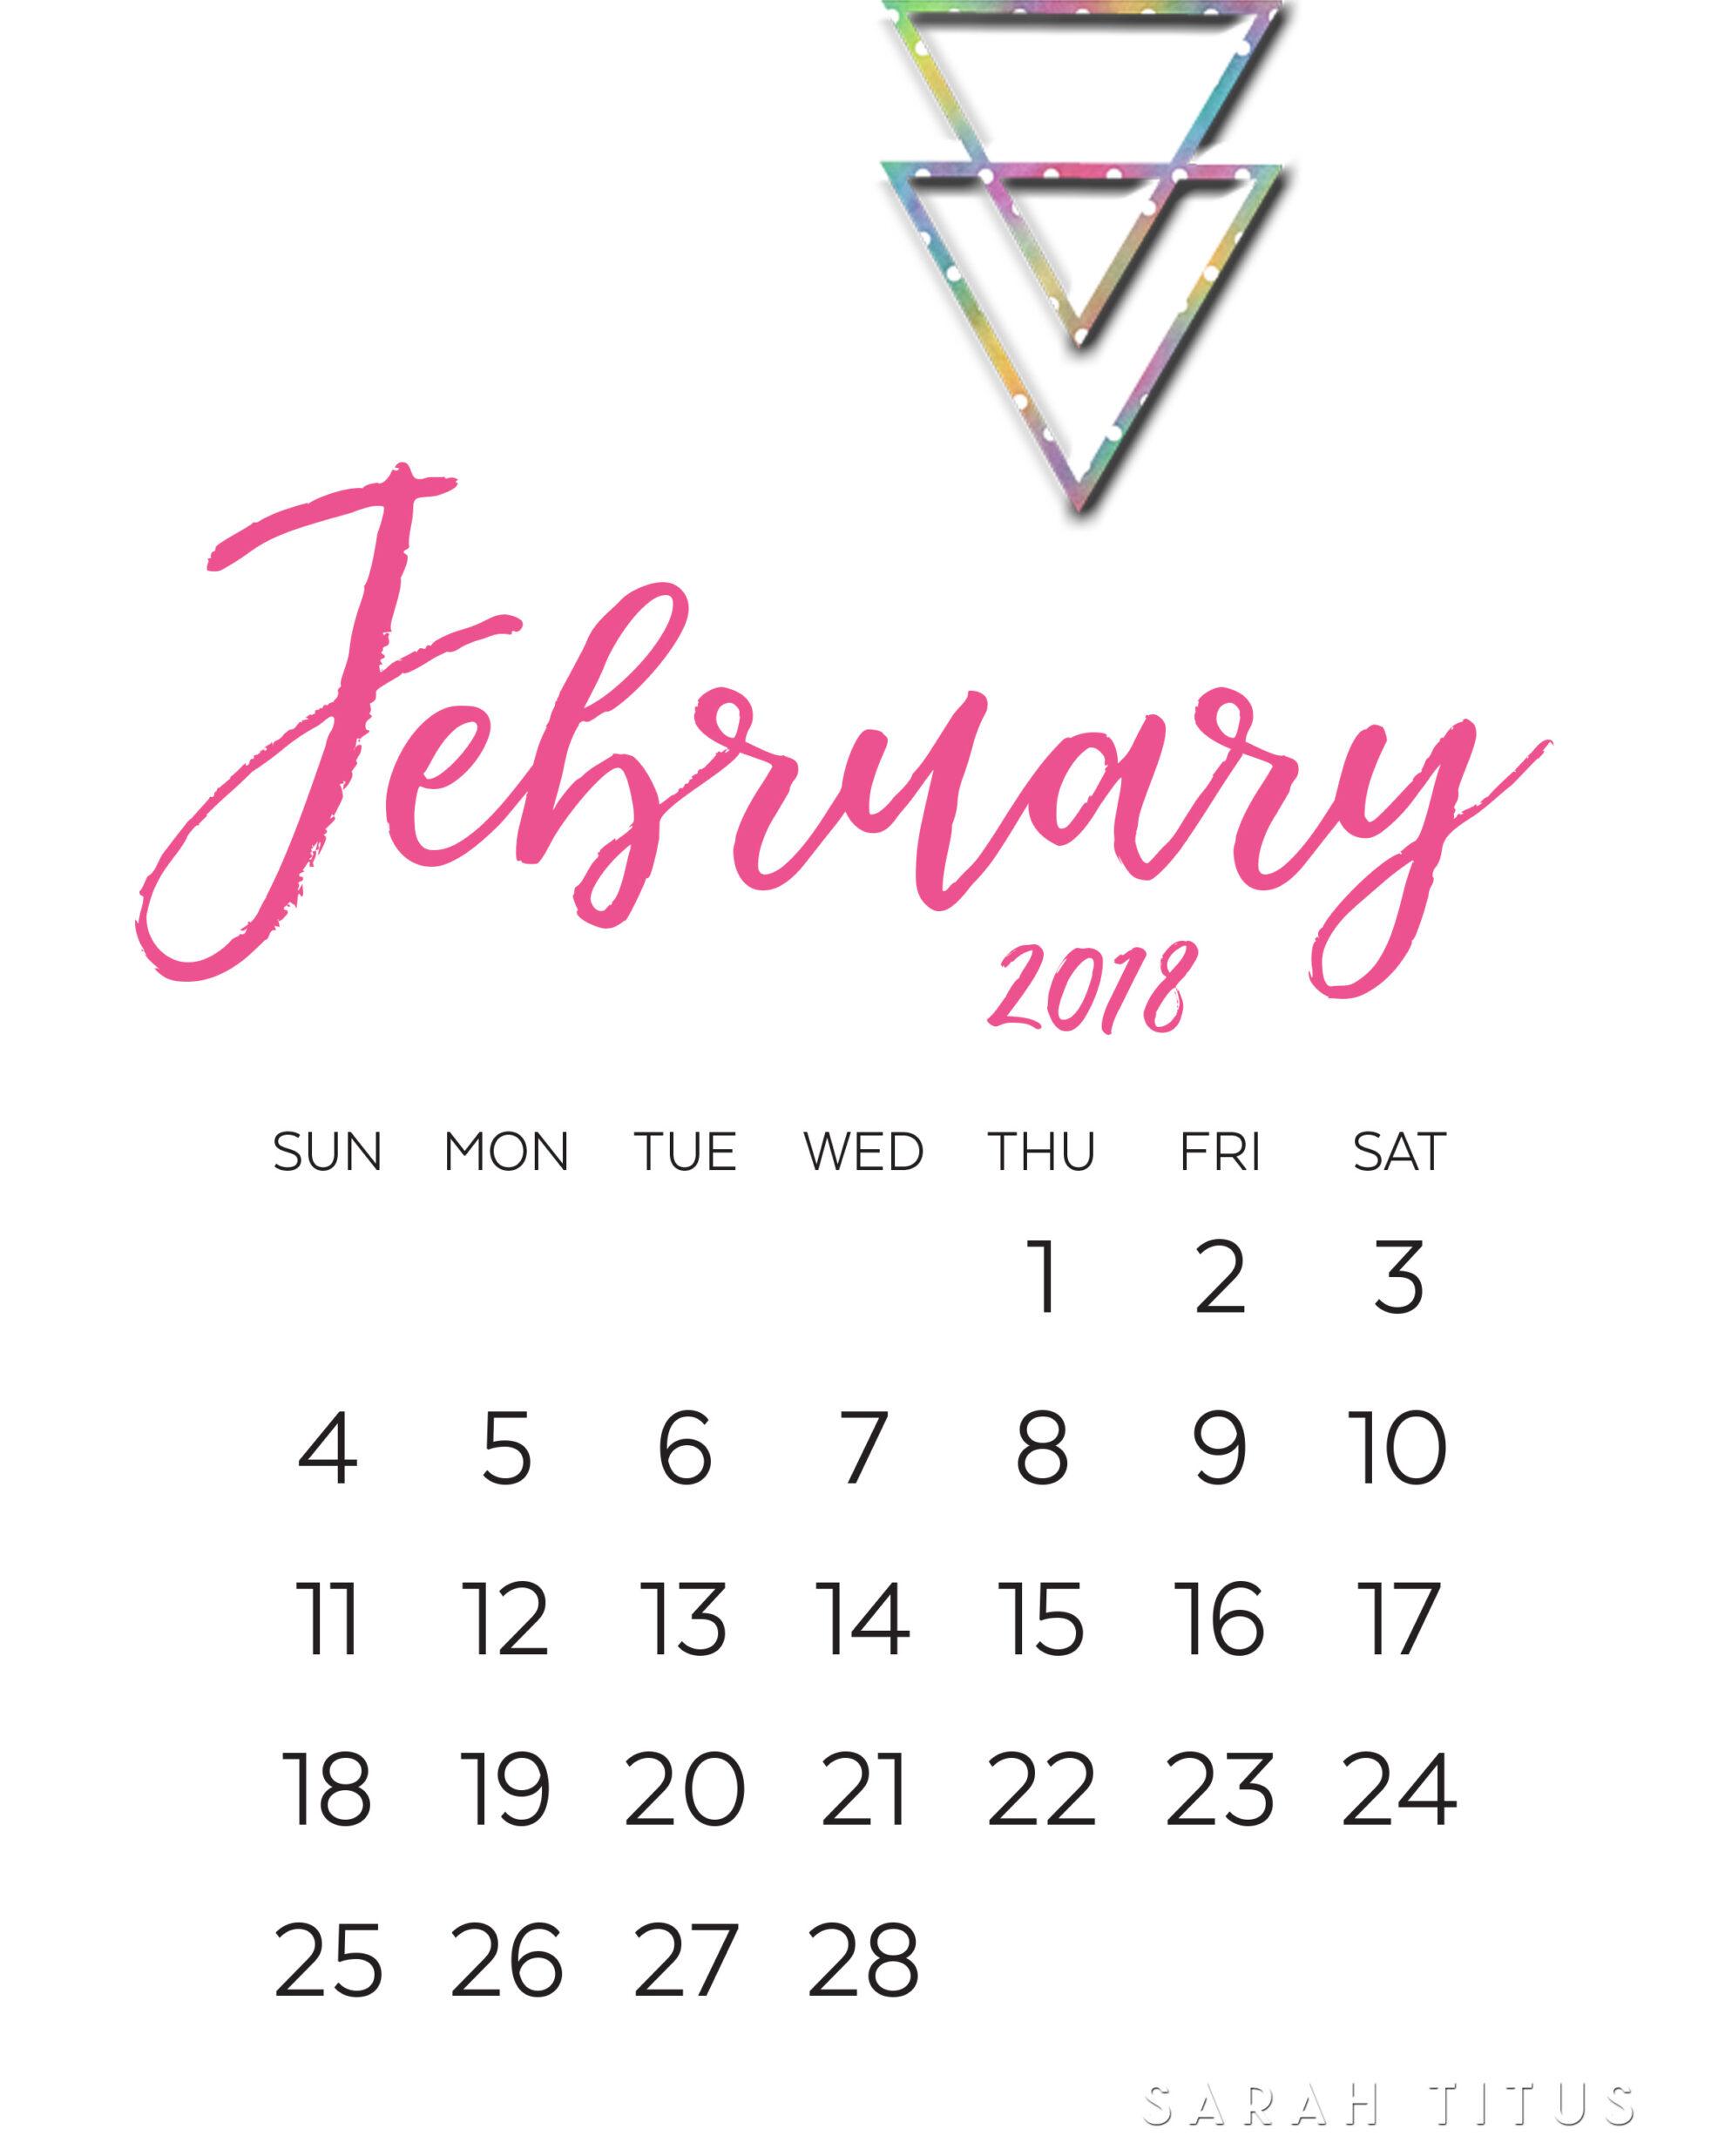 2018 Modern Monthly Calendars Printables  Sarah Titus regarding Sarah Titus Printables